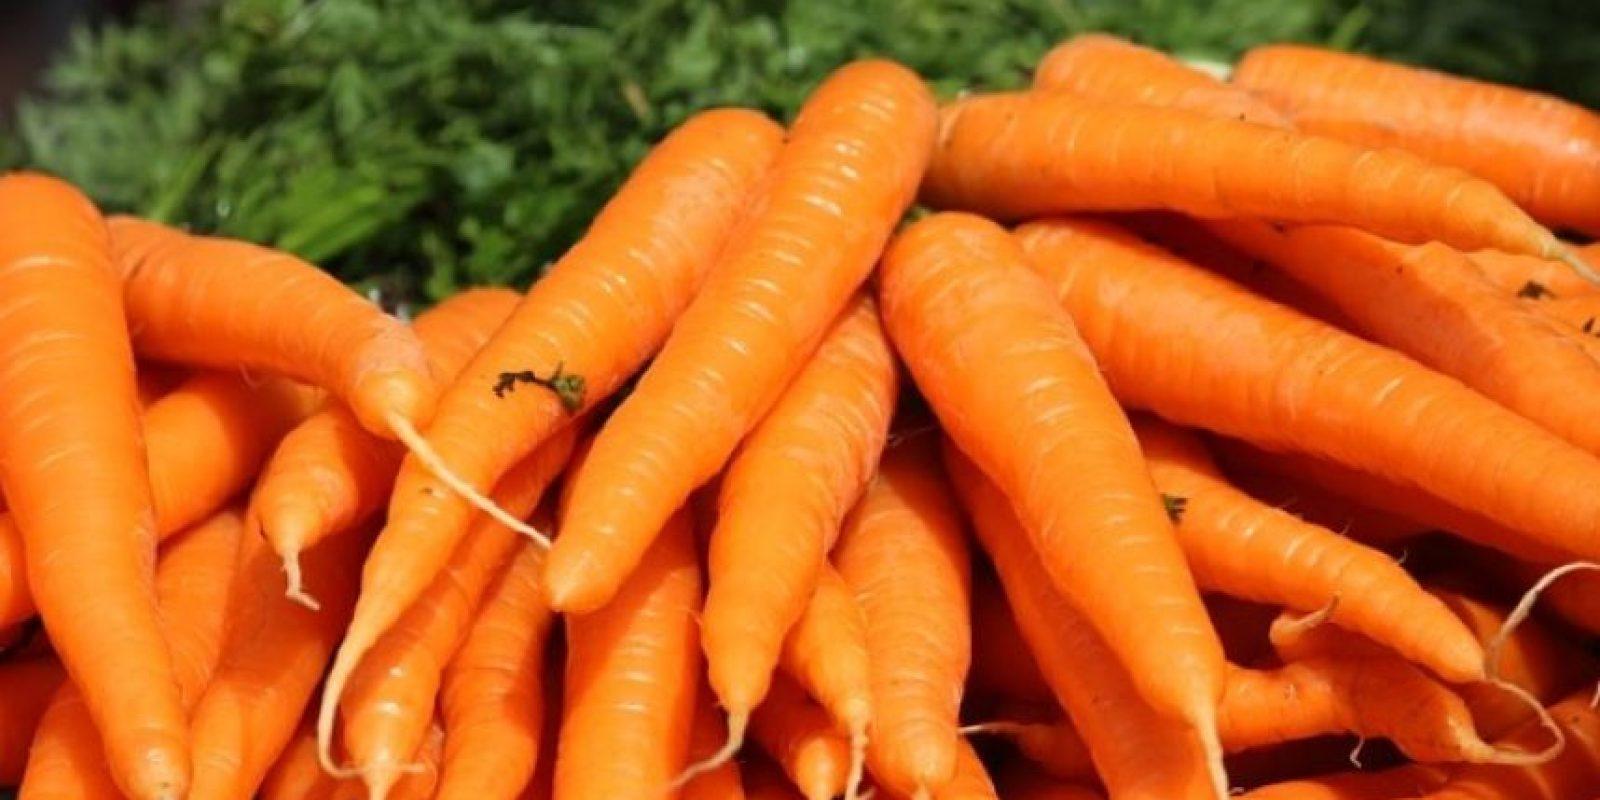 2. Zanahorias Foto:Pixabay